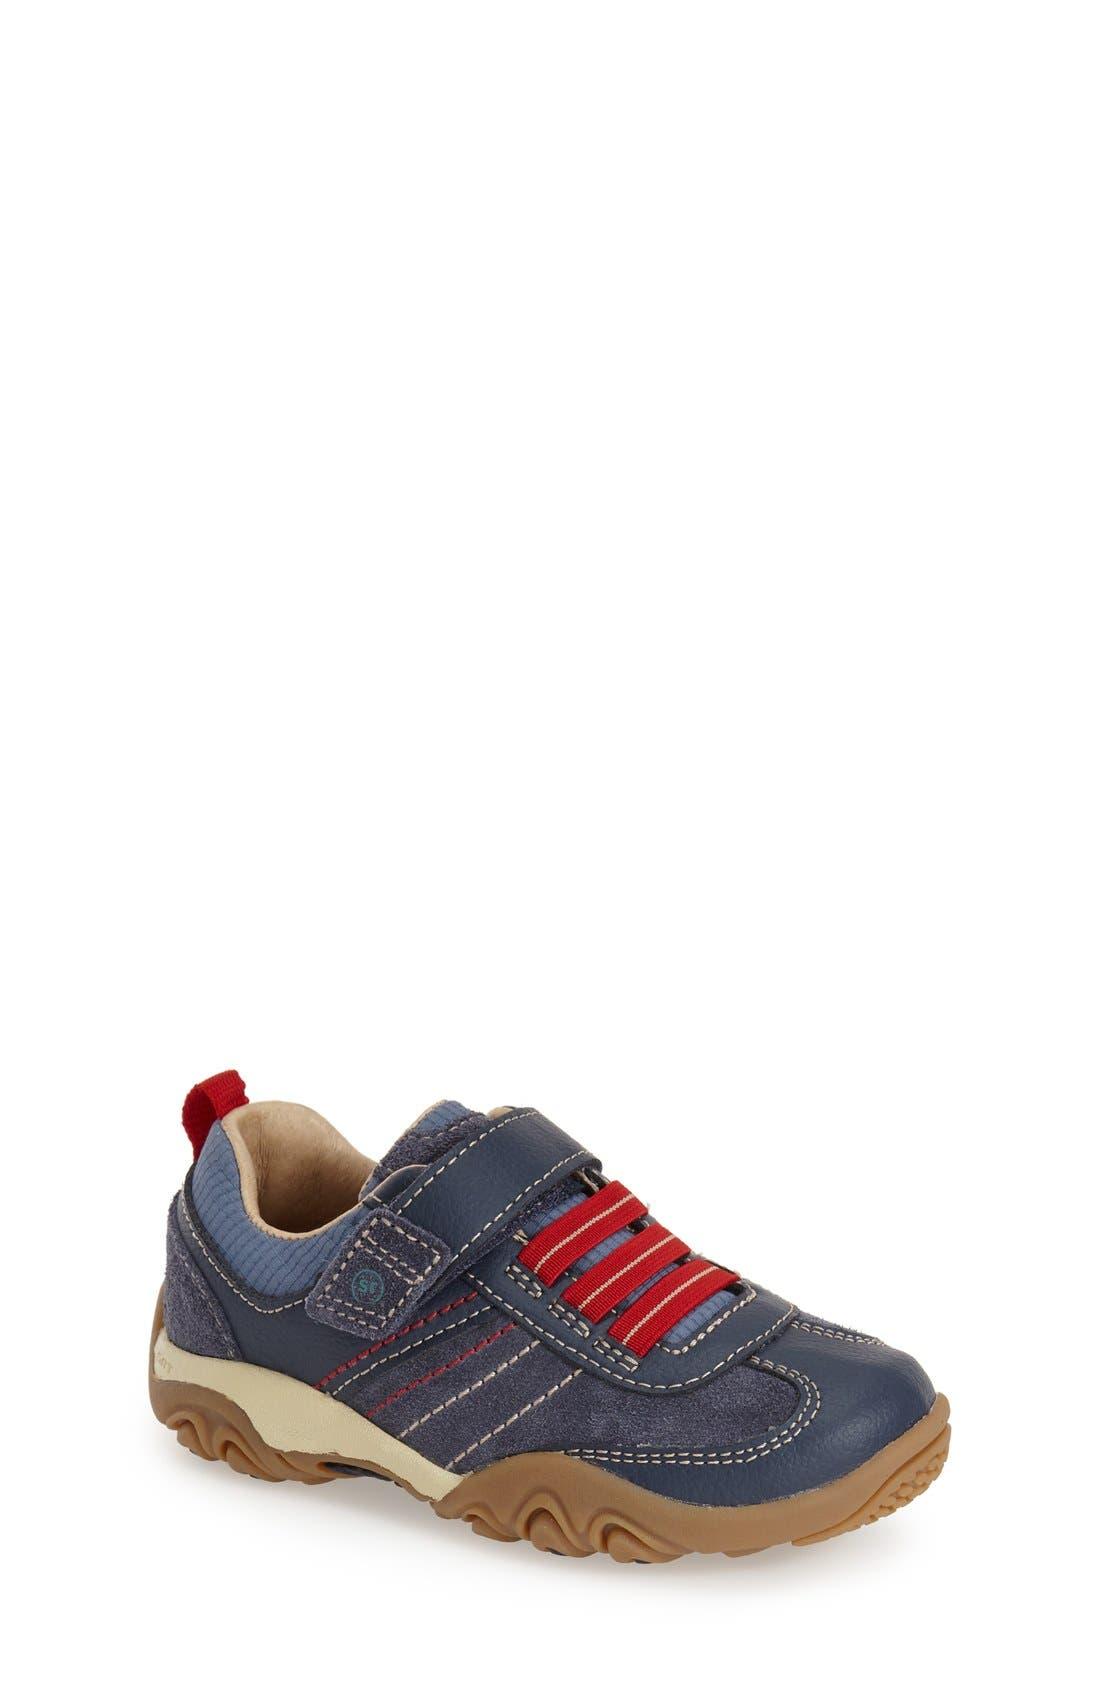 'SRT Prescott' Sneaker,                             Main thumbnail 1, color,                             Blue